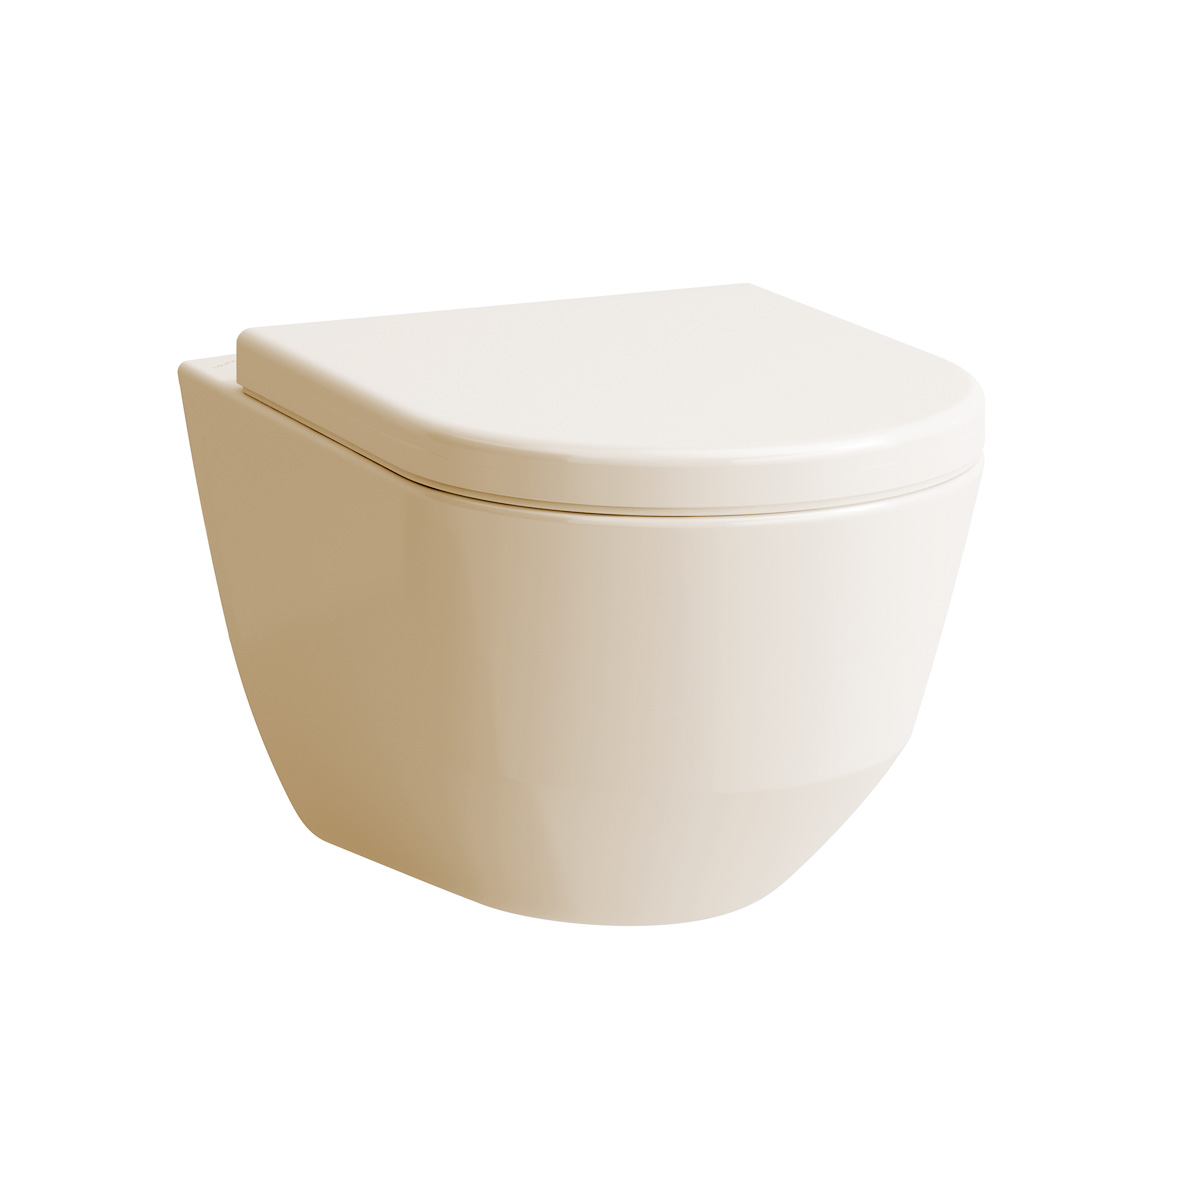 laufen pro wand flachsp l wc l 53 b 36 5 cm pergamon 8209590490001 reuter onlineshop. Black Bedroom Furniture Sets. Home Design Ideas